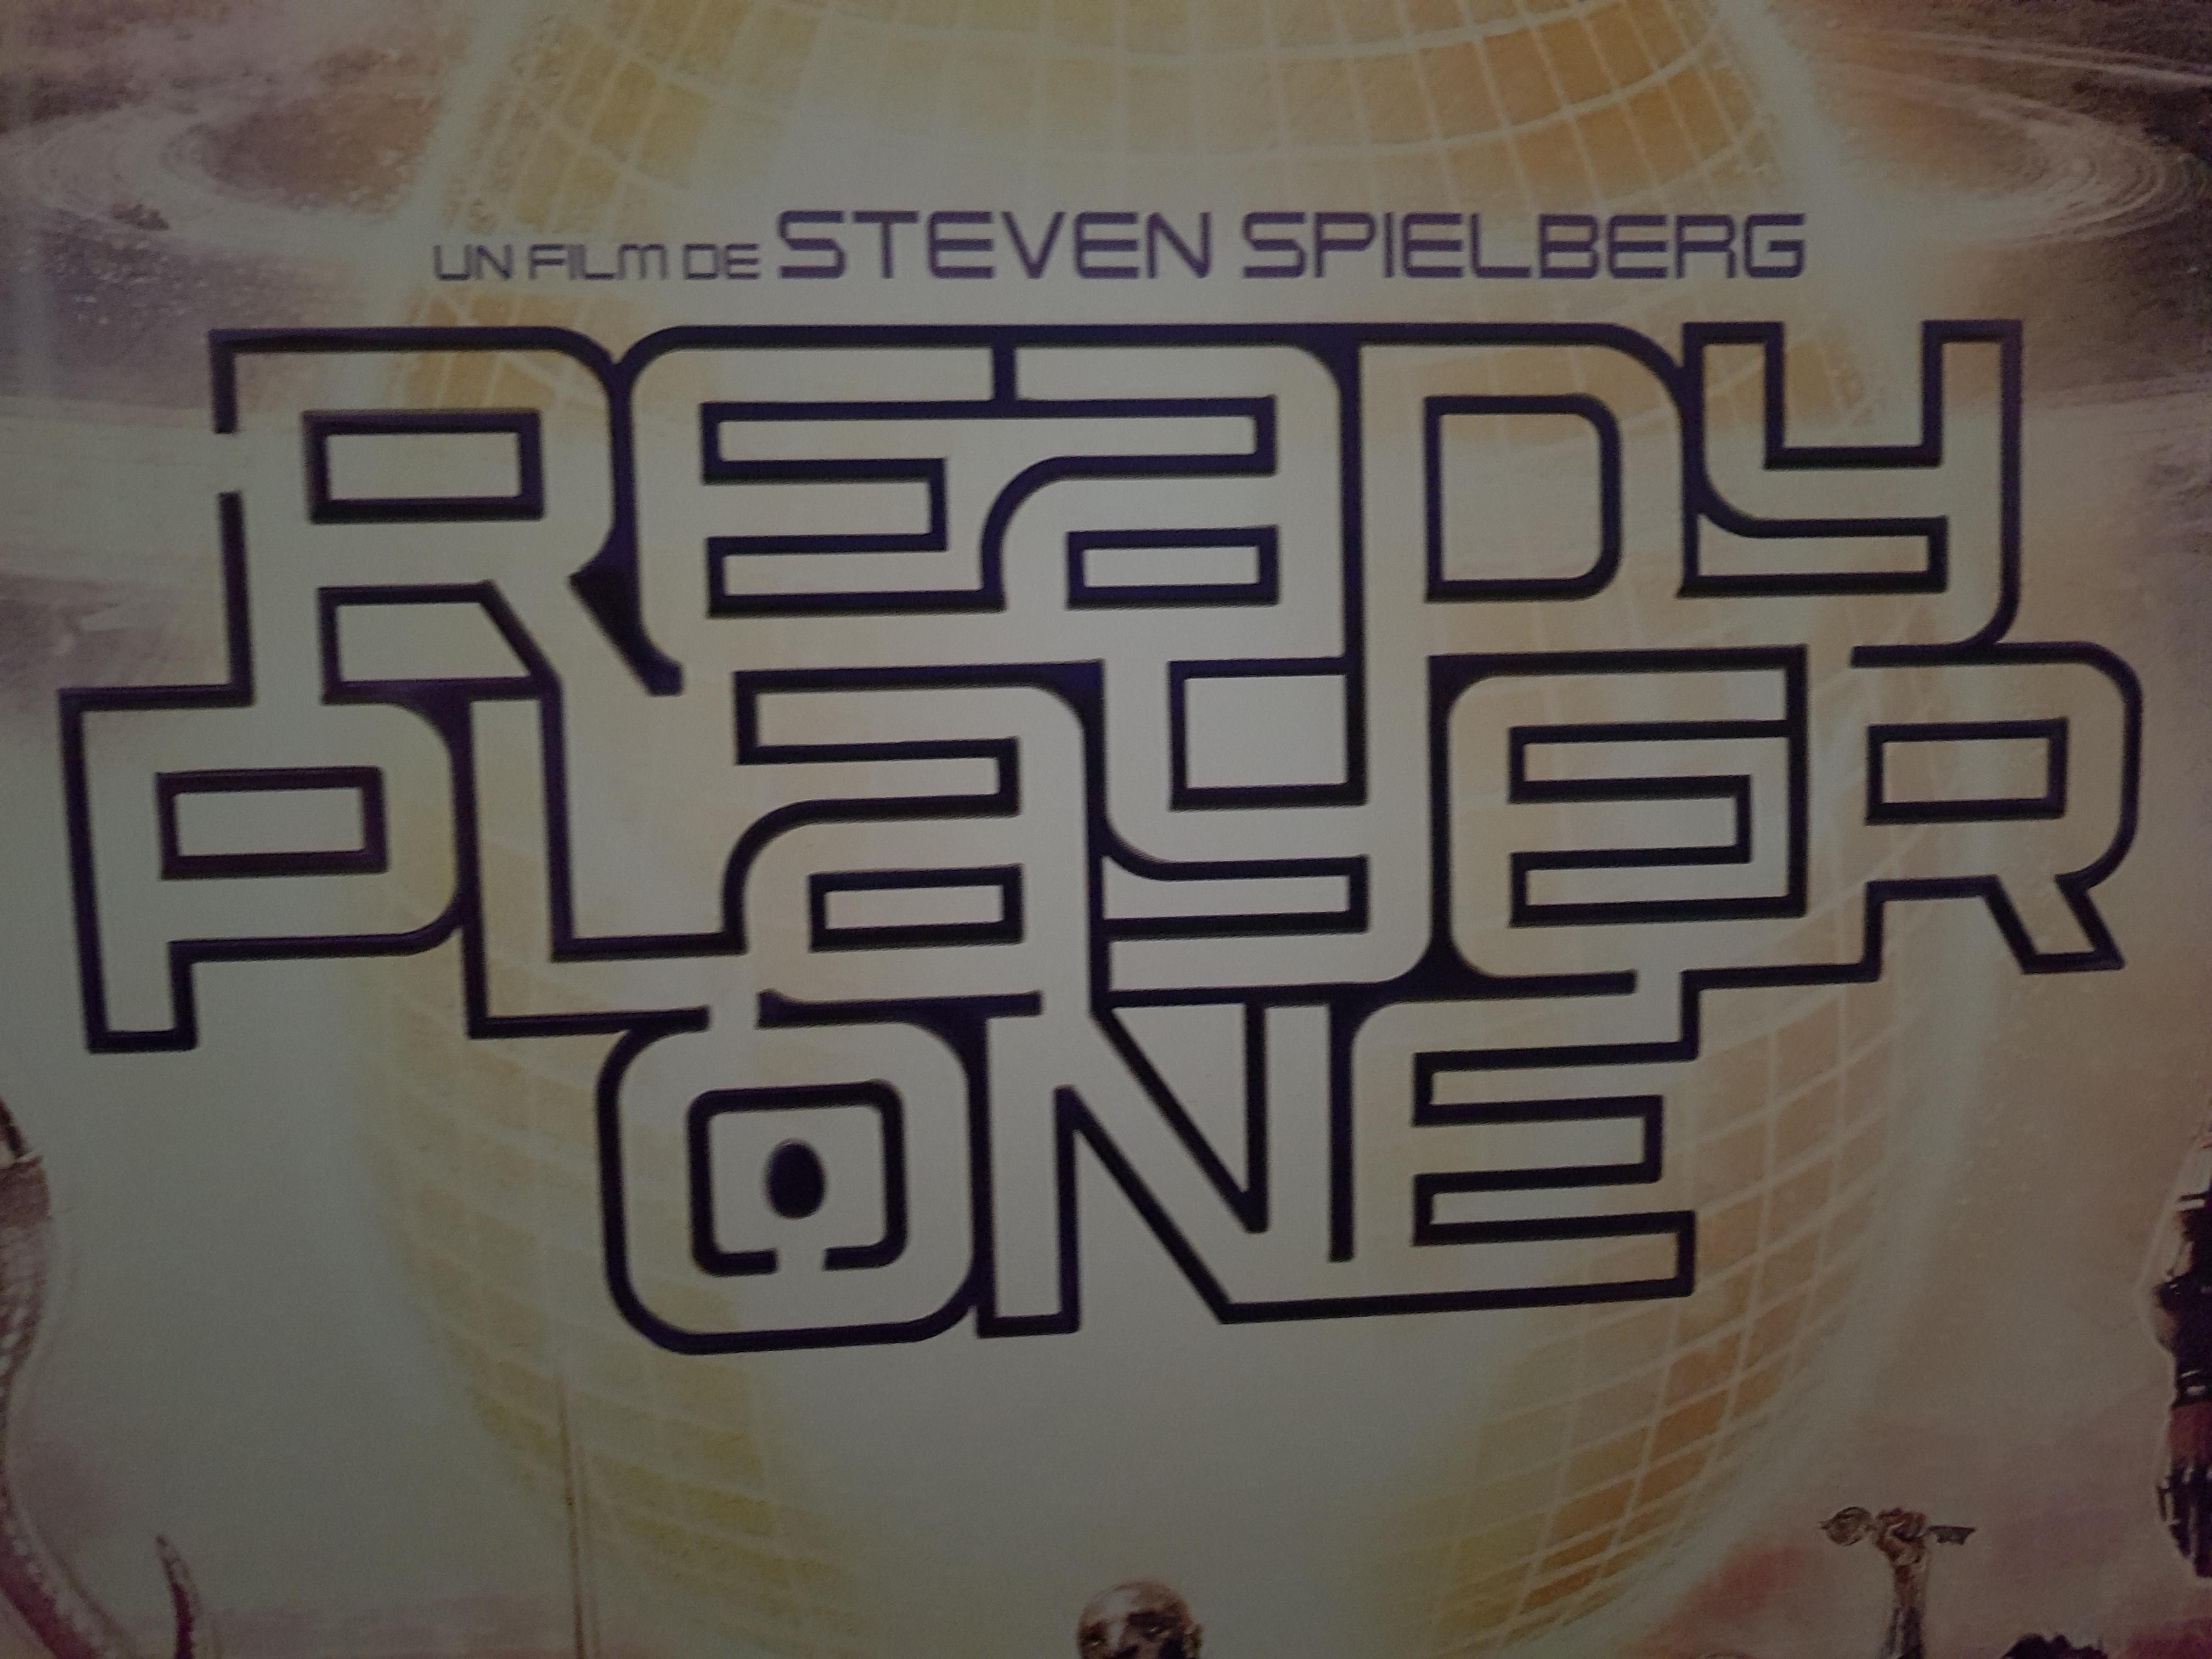 READY PLAYER ONE Movie PHOTO Print POSTER Textless Film Art Steven Spielberg 001